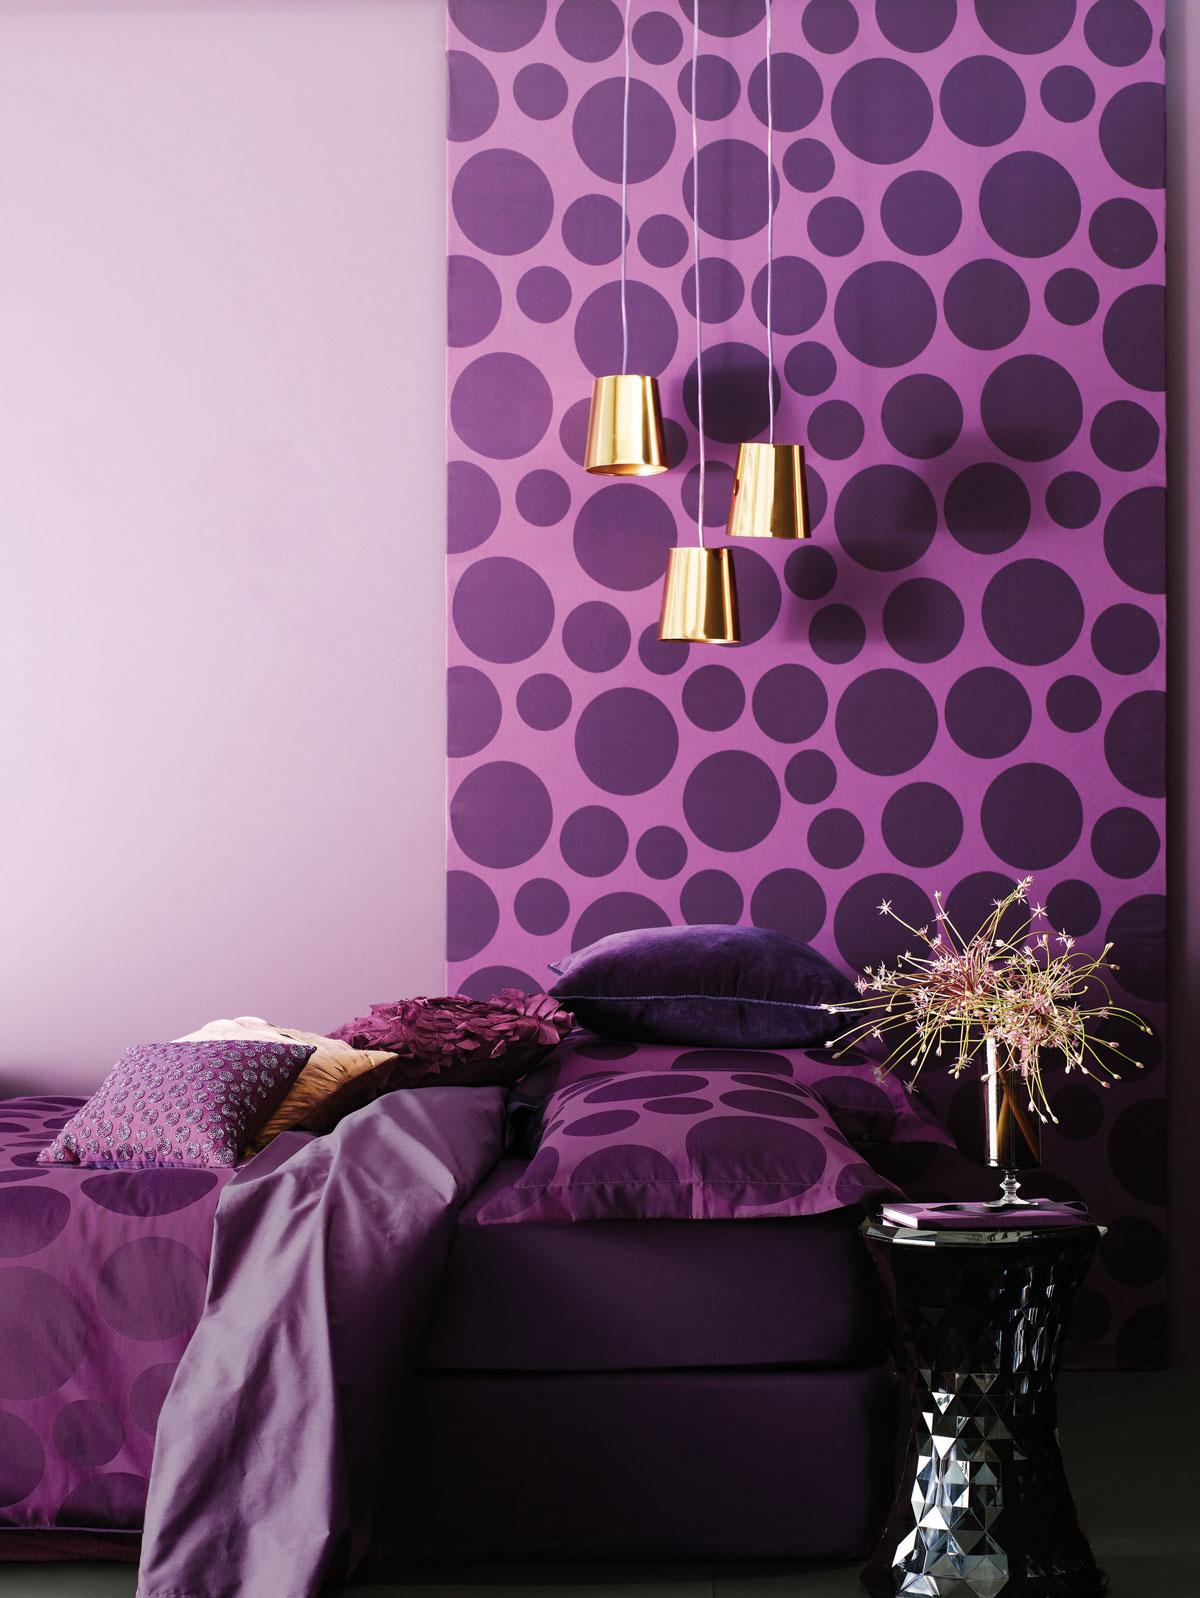 0ed11__wonderful-purple-bedroom-with-beautiful-wallpaper